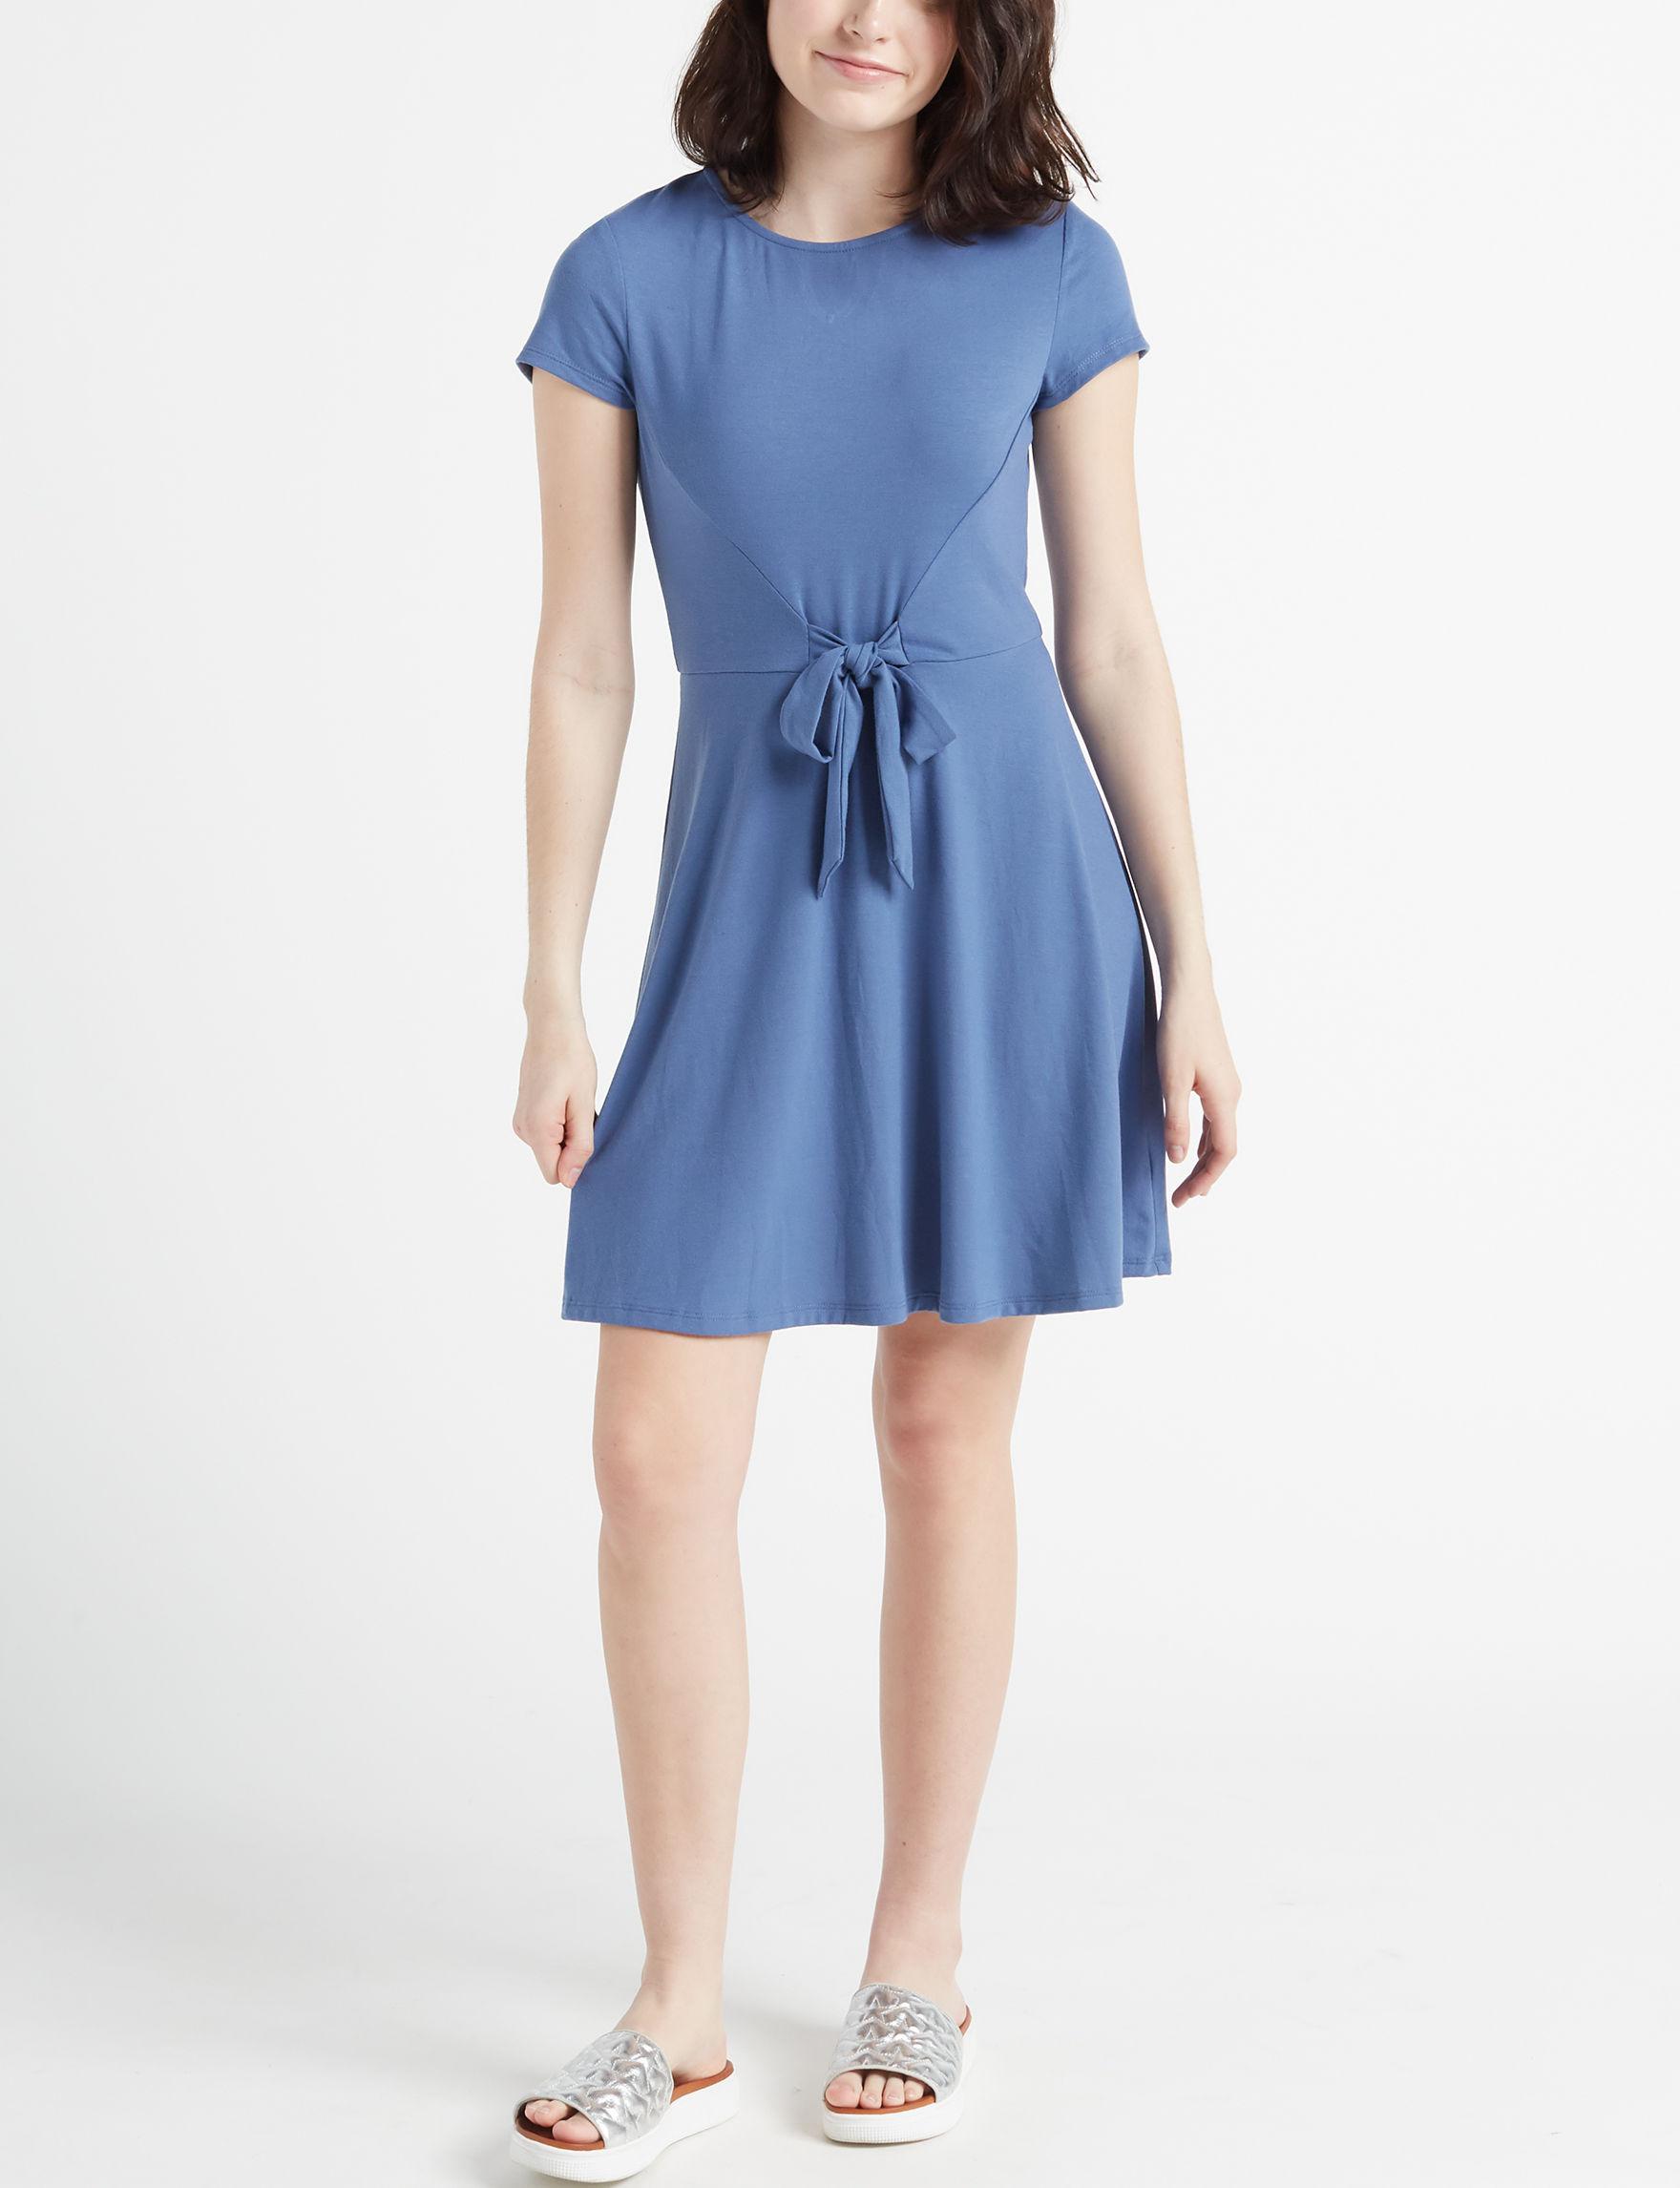 BeBop Dark Blue Everyday & Casual Shift Dresses